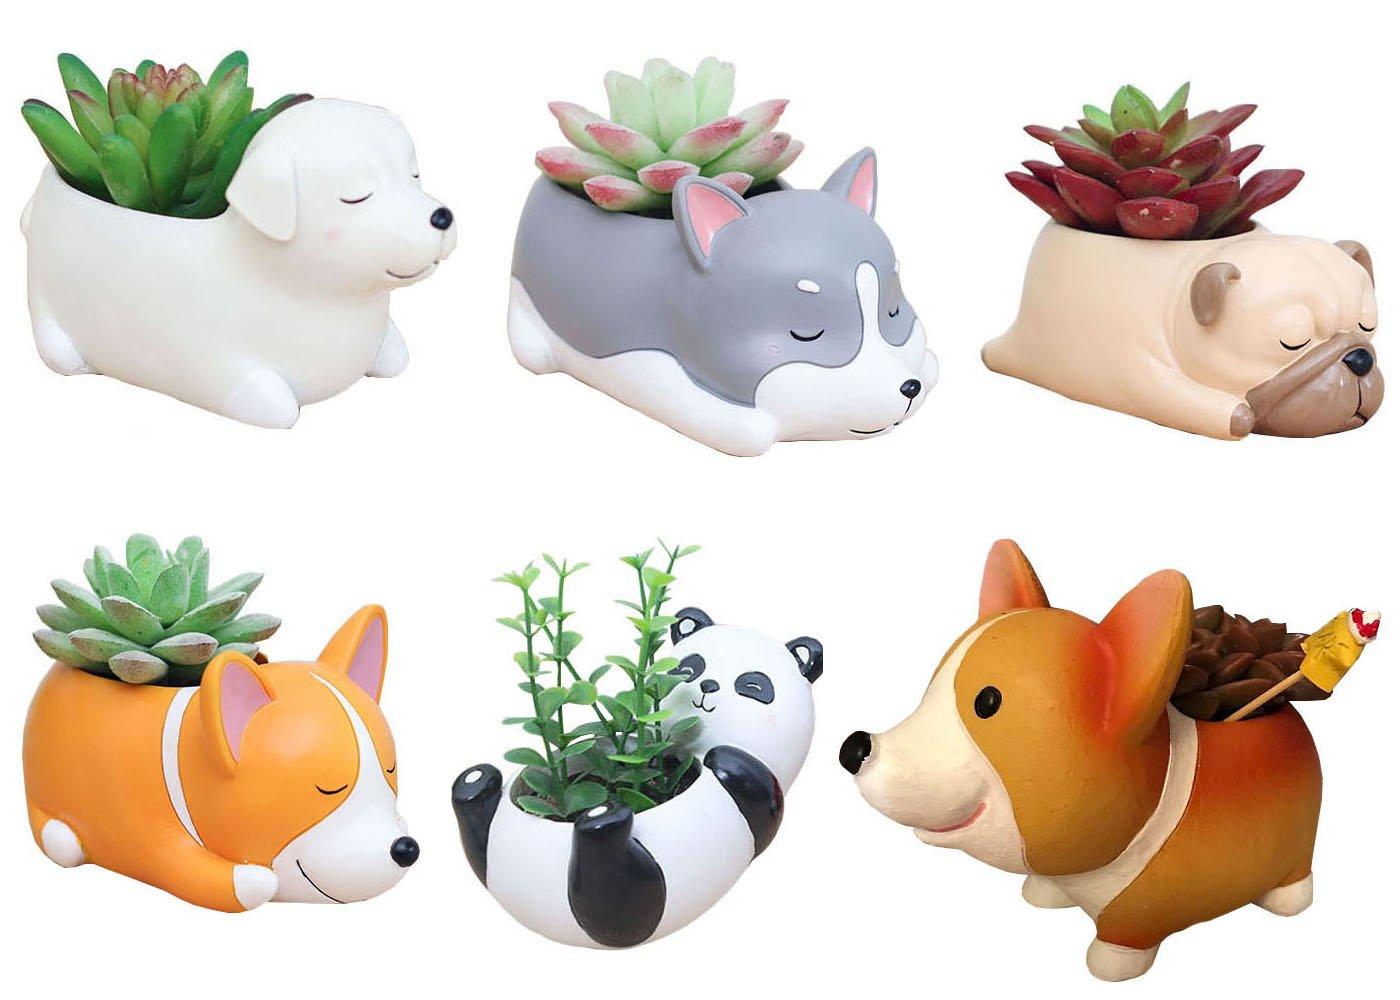 6 PCS Set Cute Cartoon Animal Corgi Husky Labrador Pug Panda Shaped Succulent Cactus Flower Pot/Plant Pots/Planter/Container for Home Garden Office Desktop Decoration (Plants Not Included) by Cuteforyou